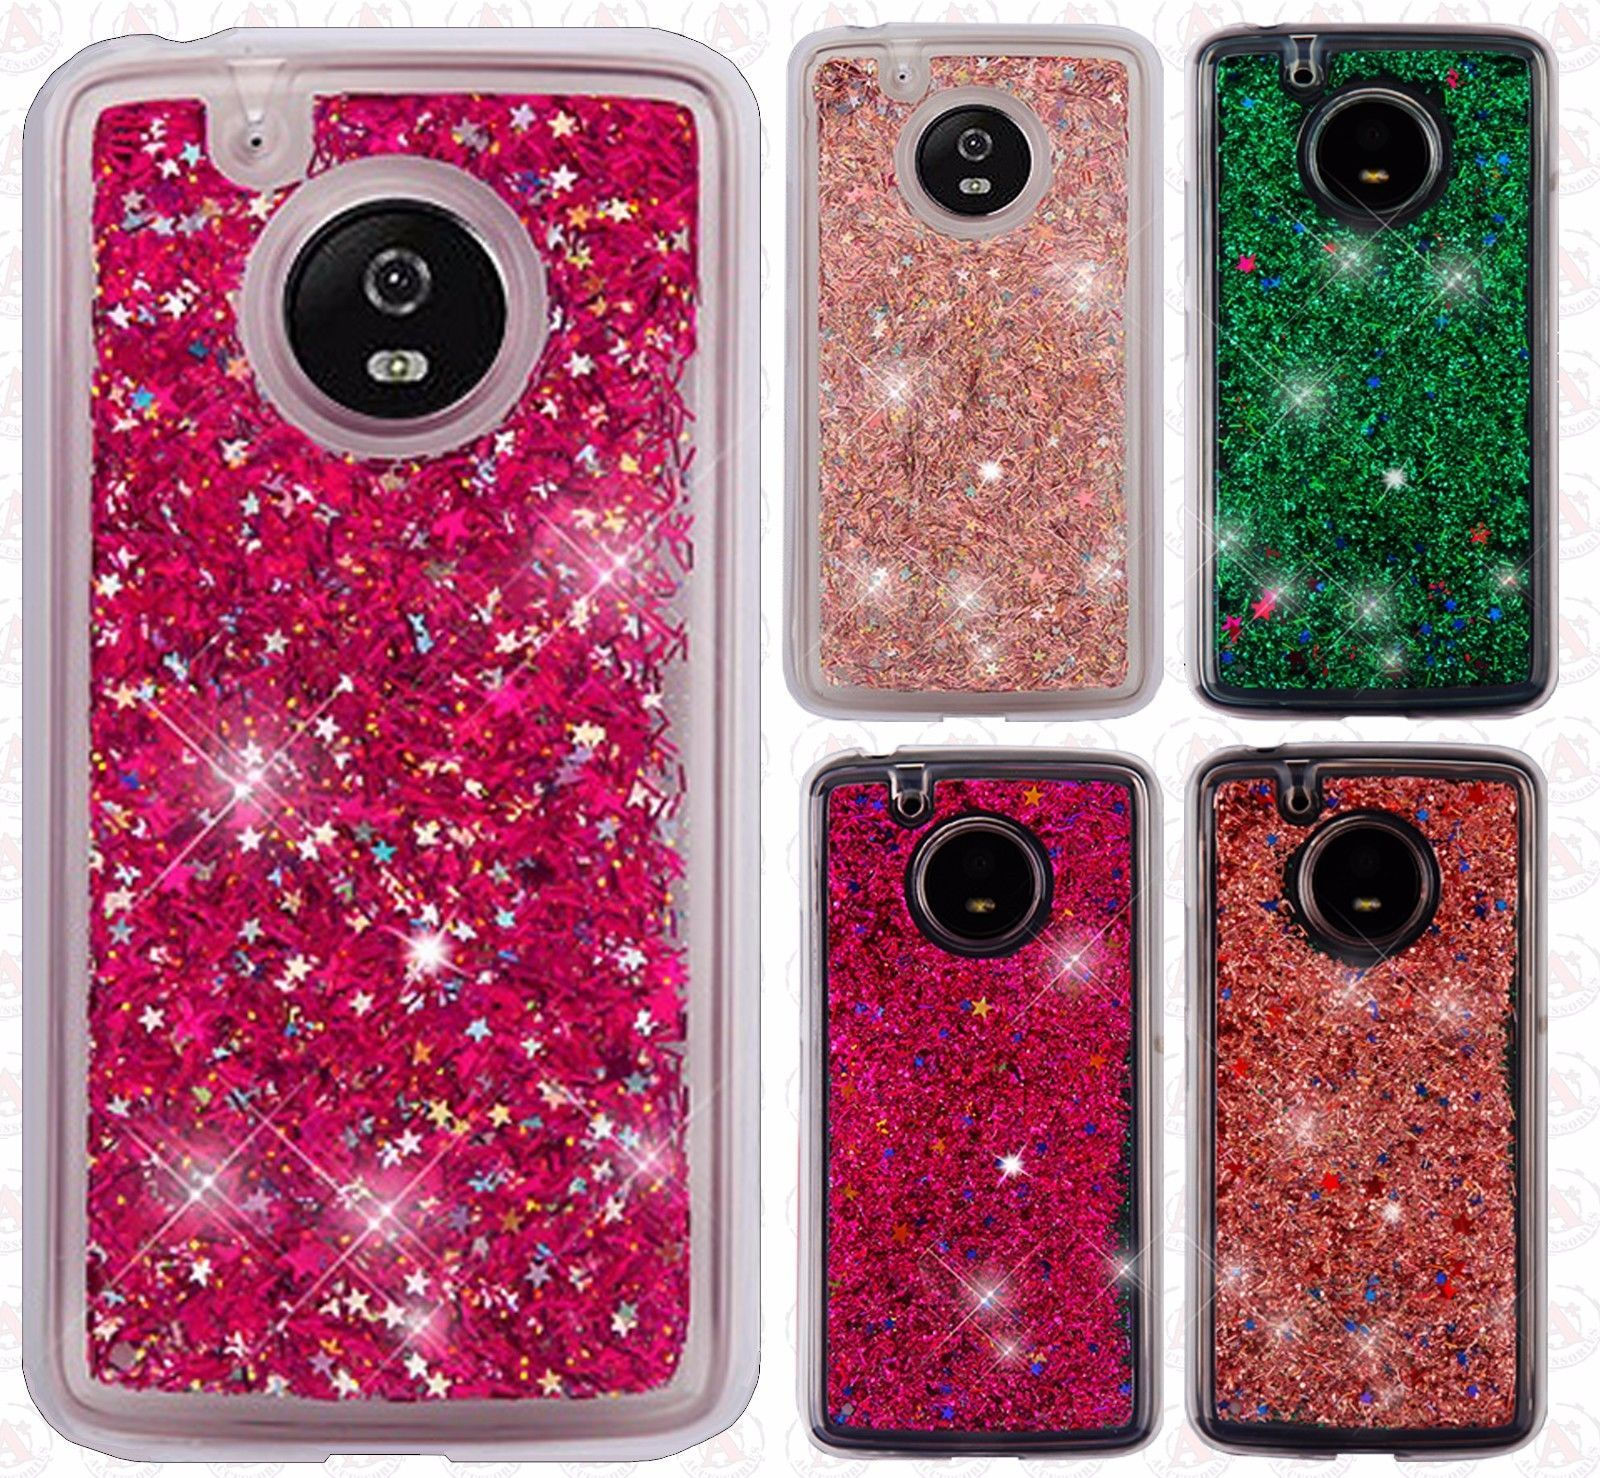 half off 48ed2 4eaea Details about For Motorola Moto E4 Liquid Glitter Quicksand Hard ...